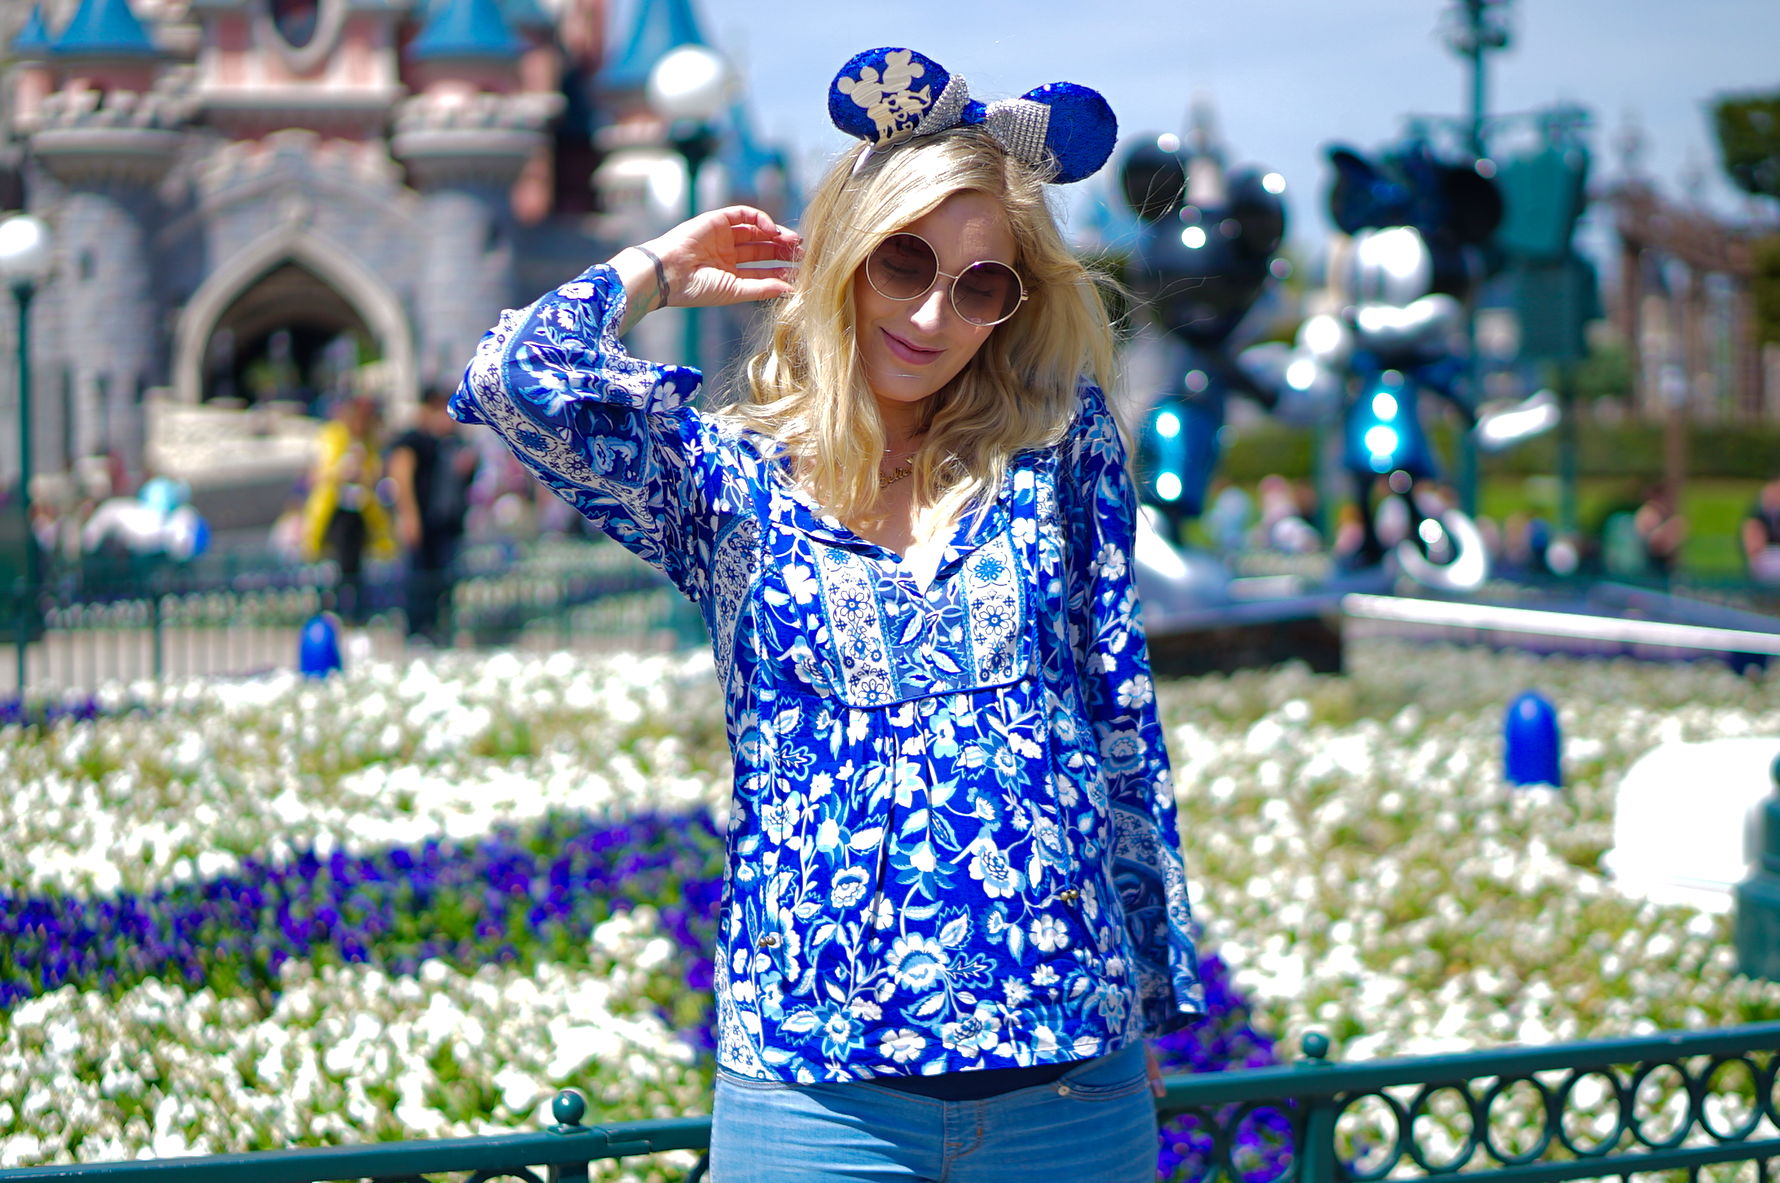 Disney Friday: Disneyland Outfit - 25th Anniversary